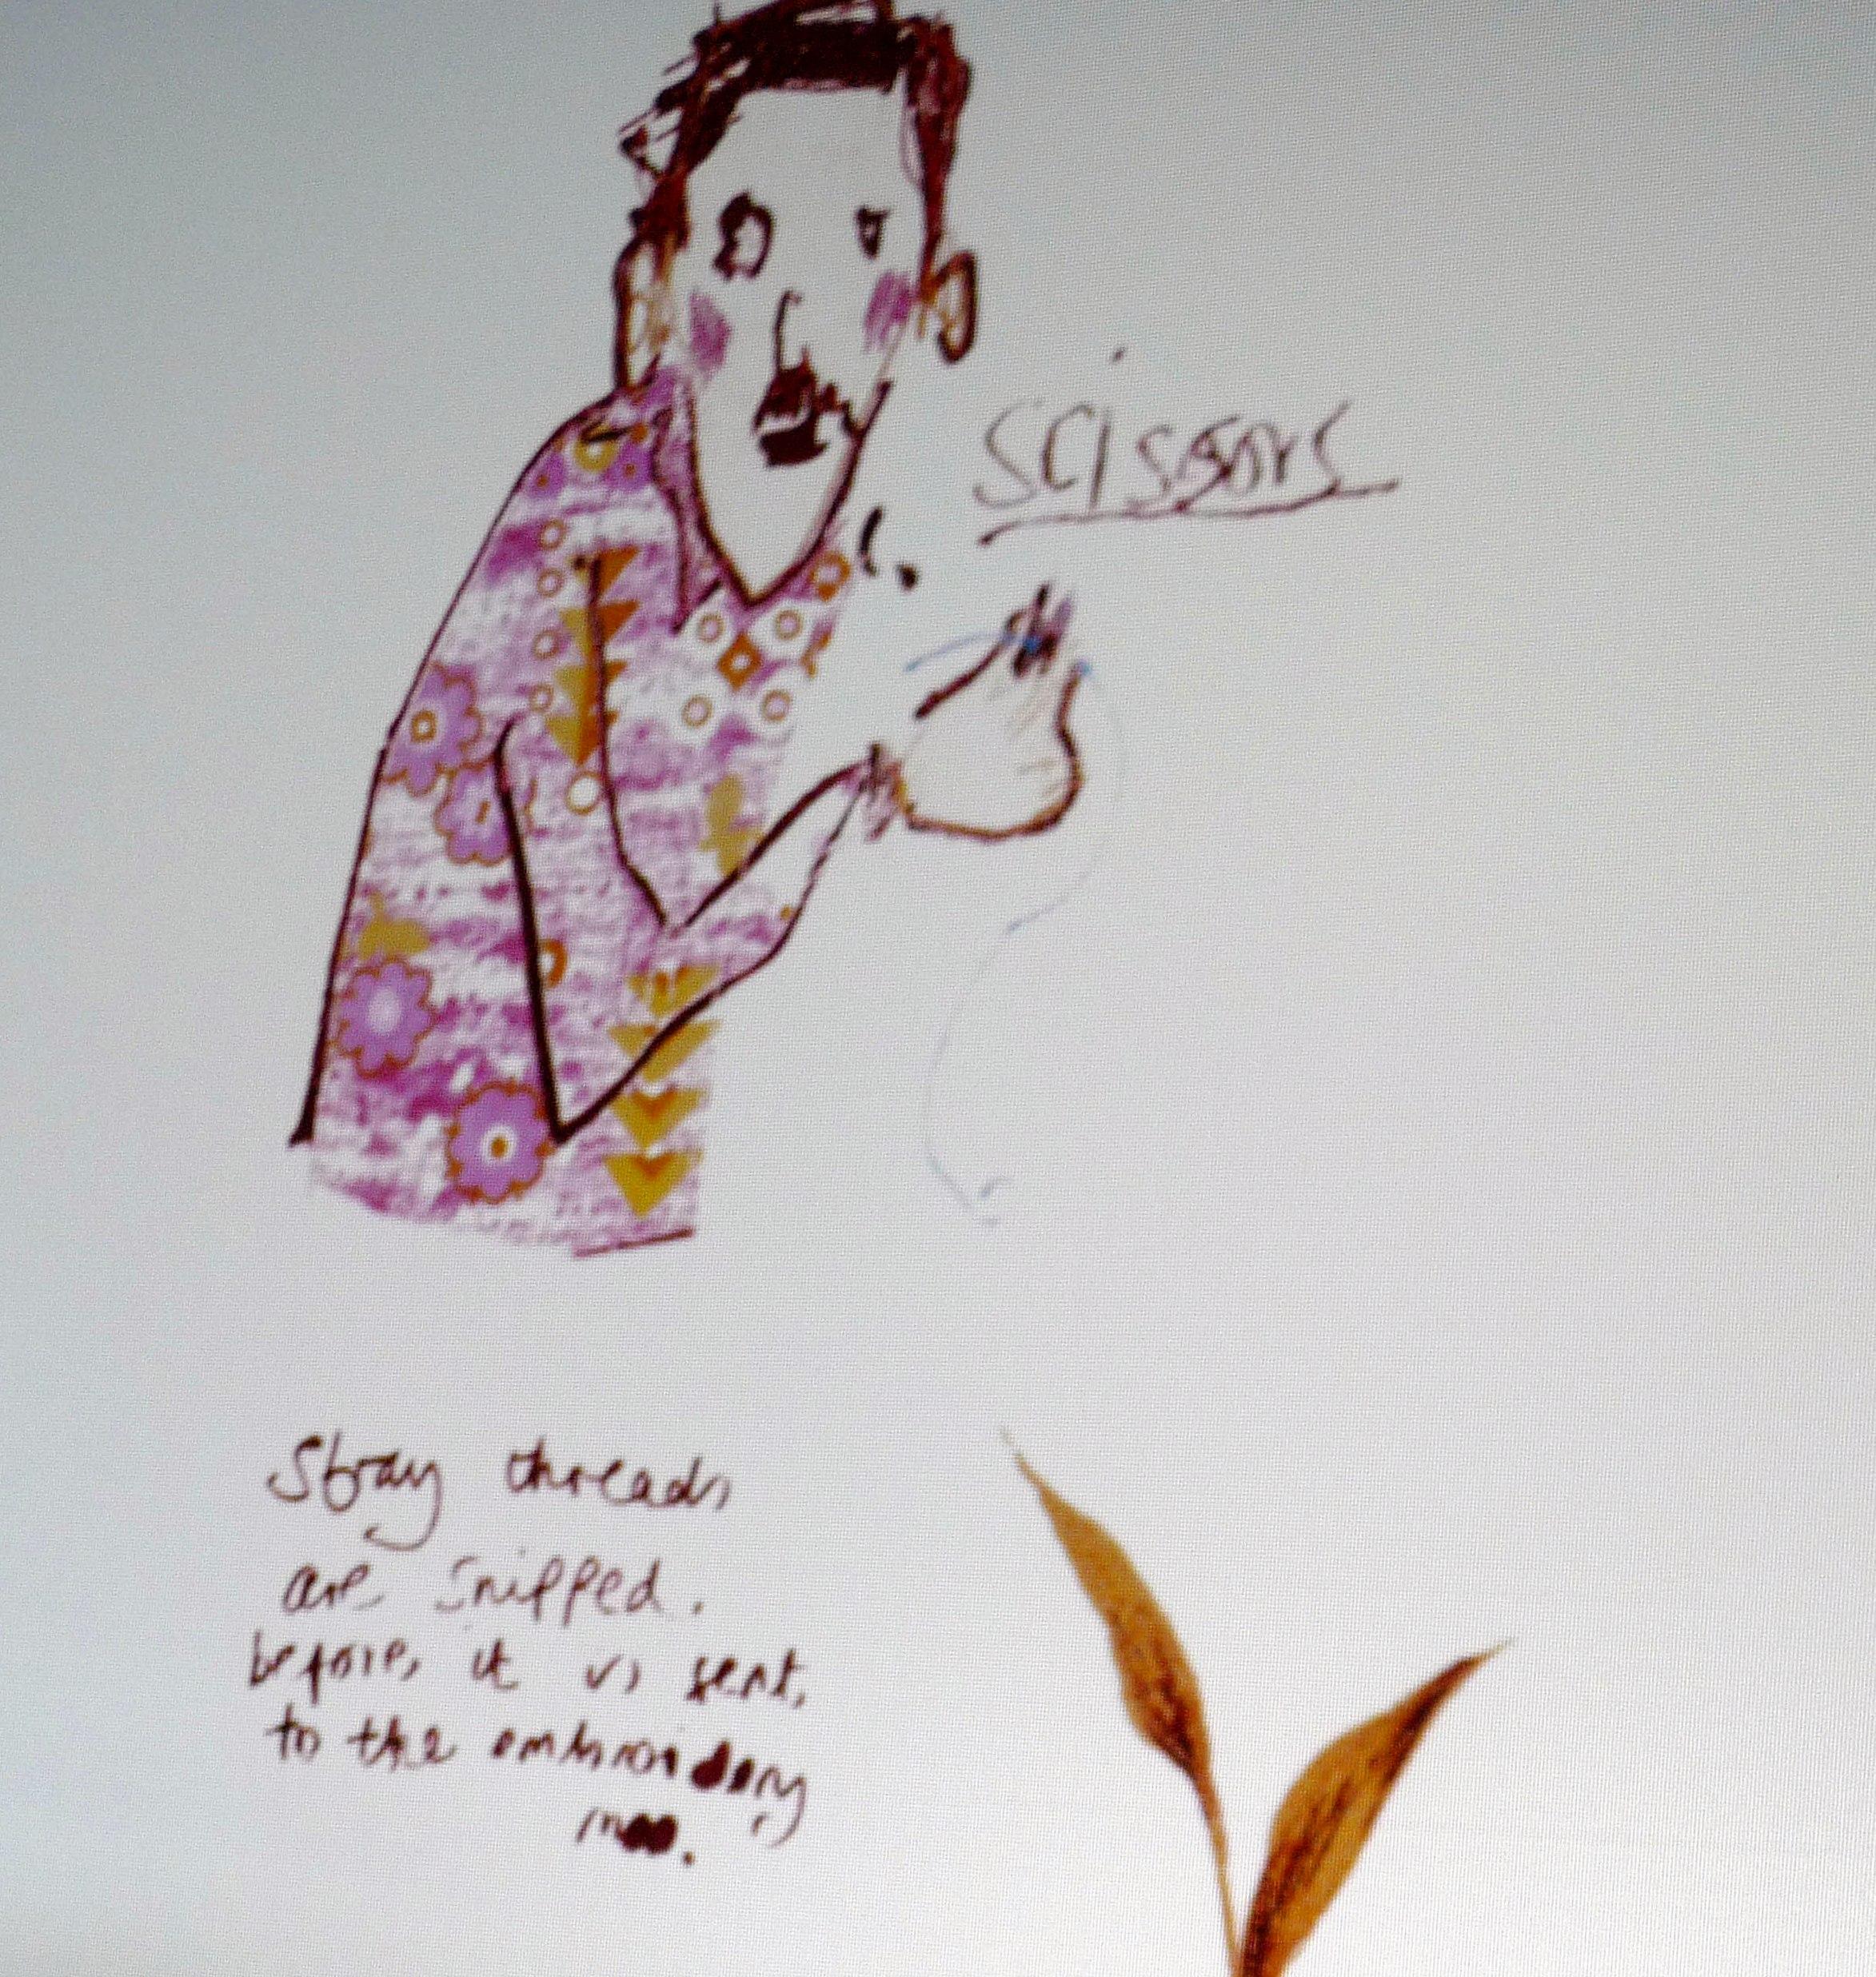 slide showing a sketch by Rachael Howard